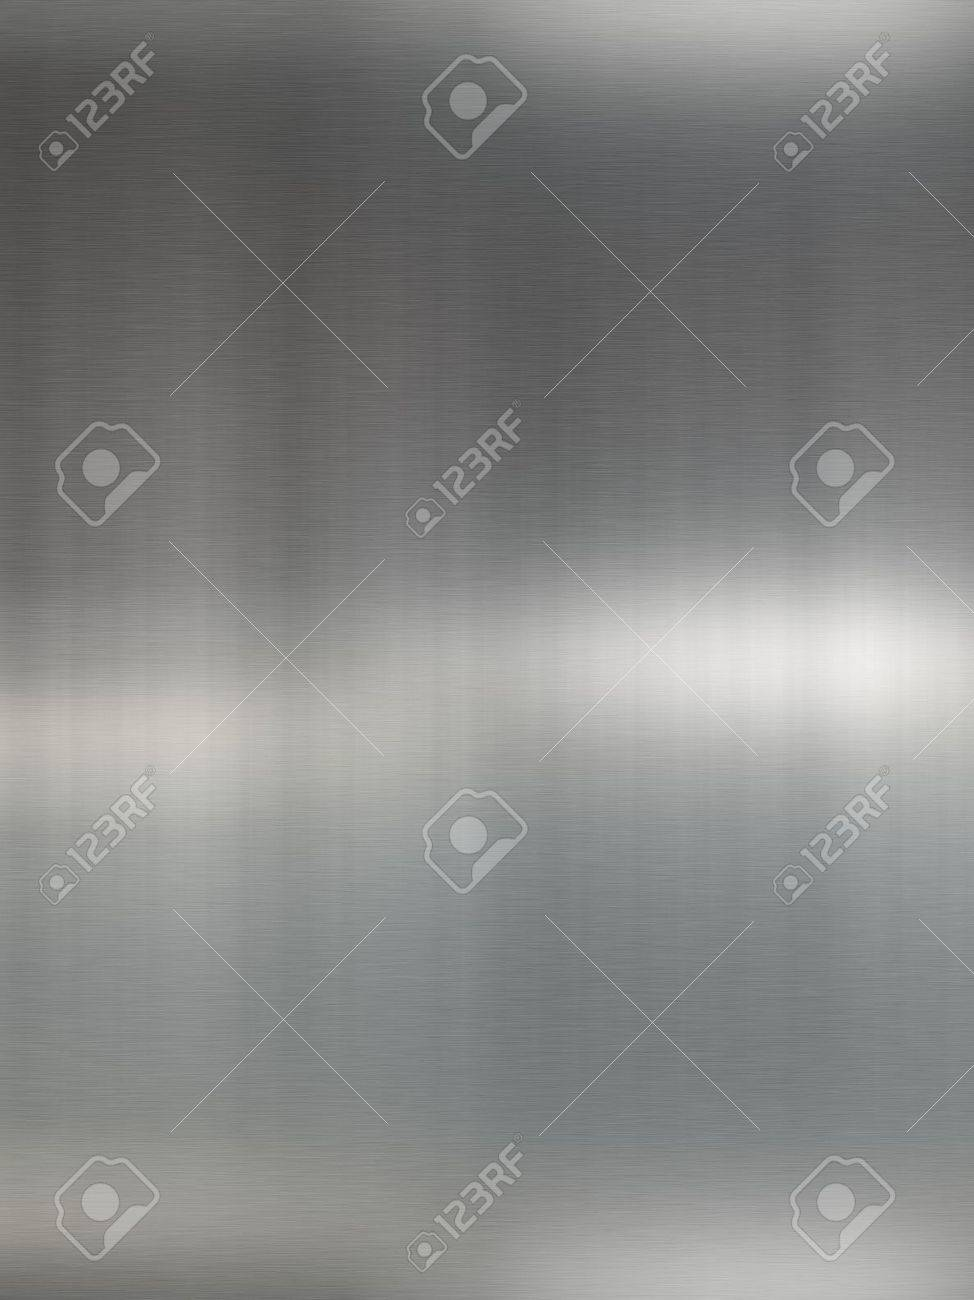 brushed metal texture Stock Photo - 6069320